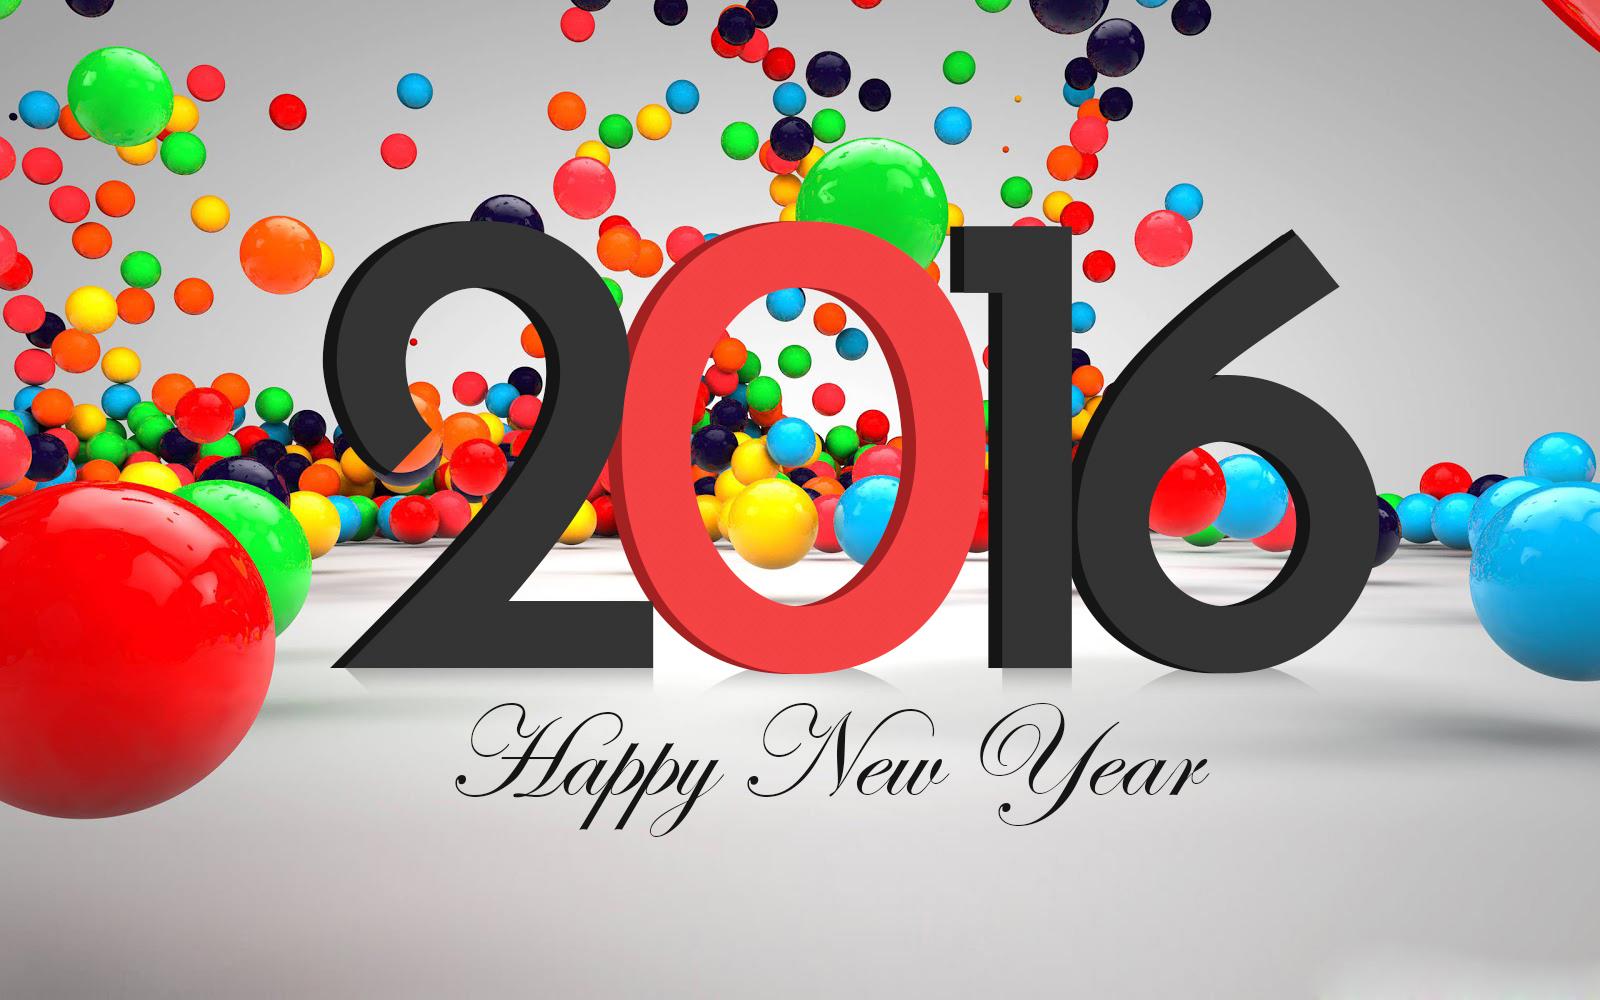 3d-happy-new-year-2016-wallpaper.jpg